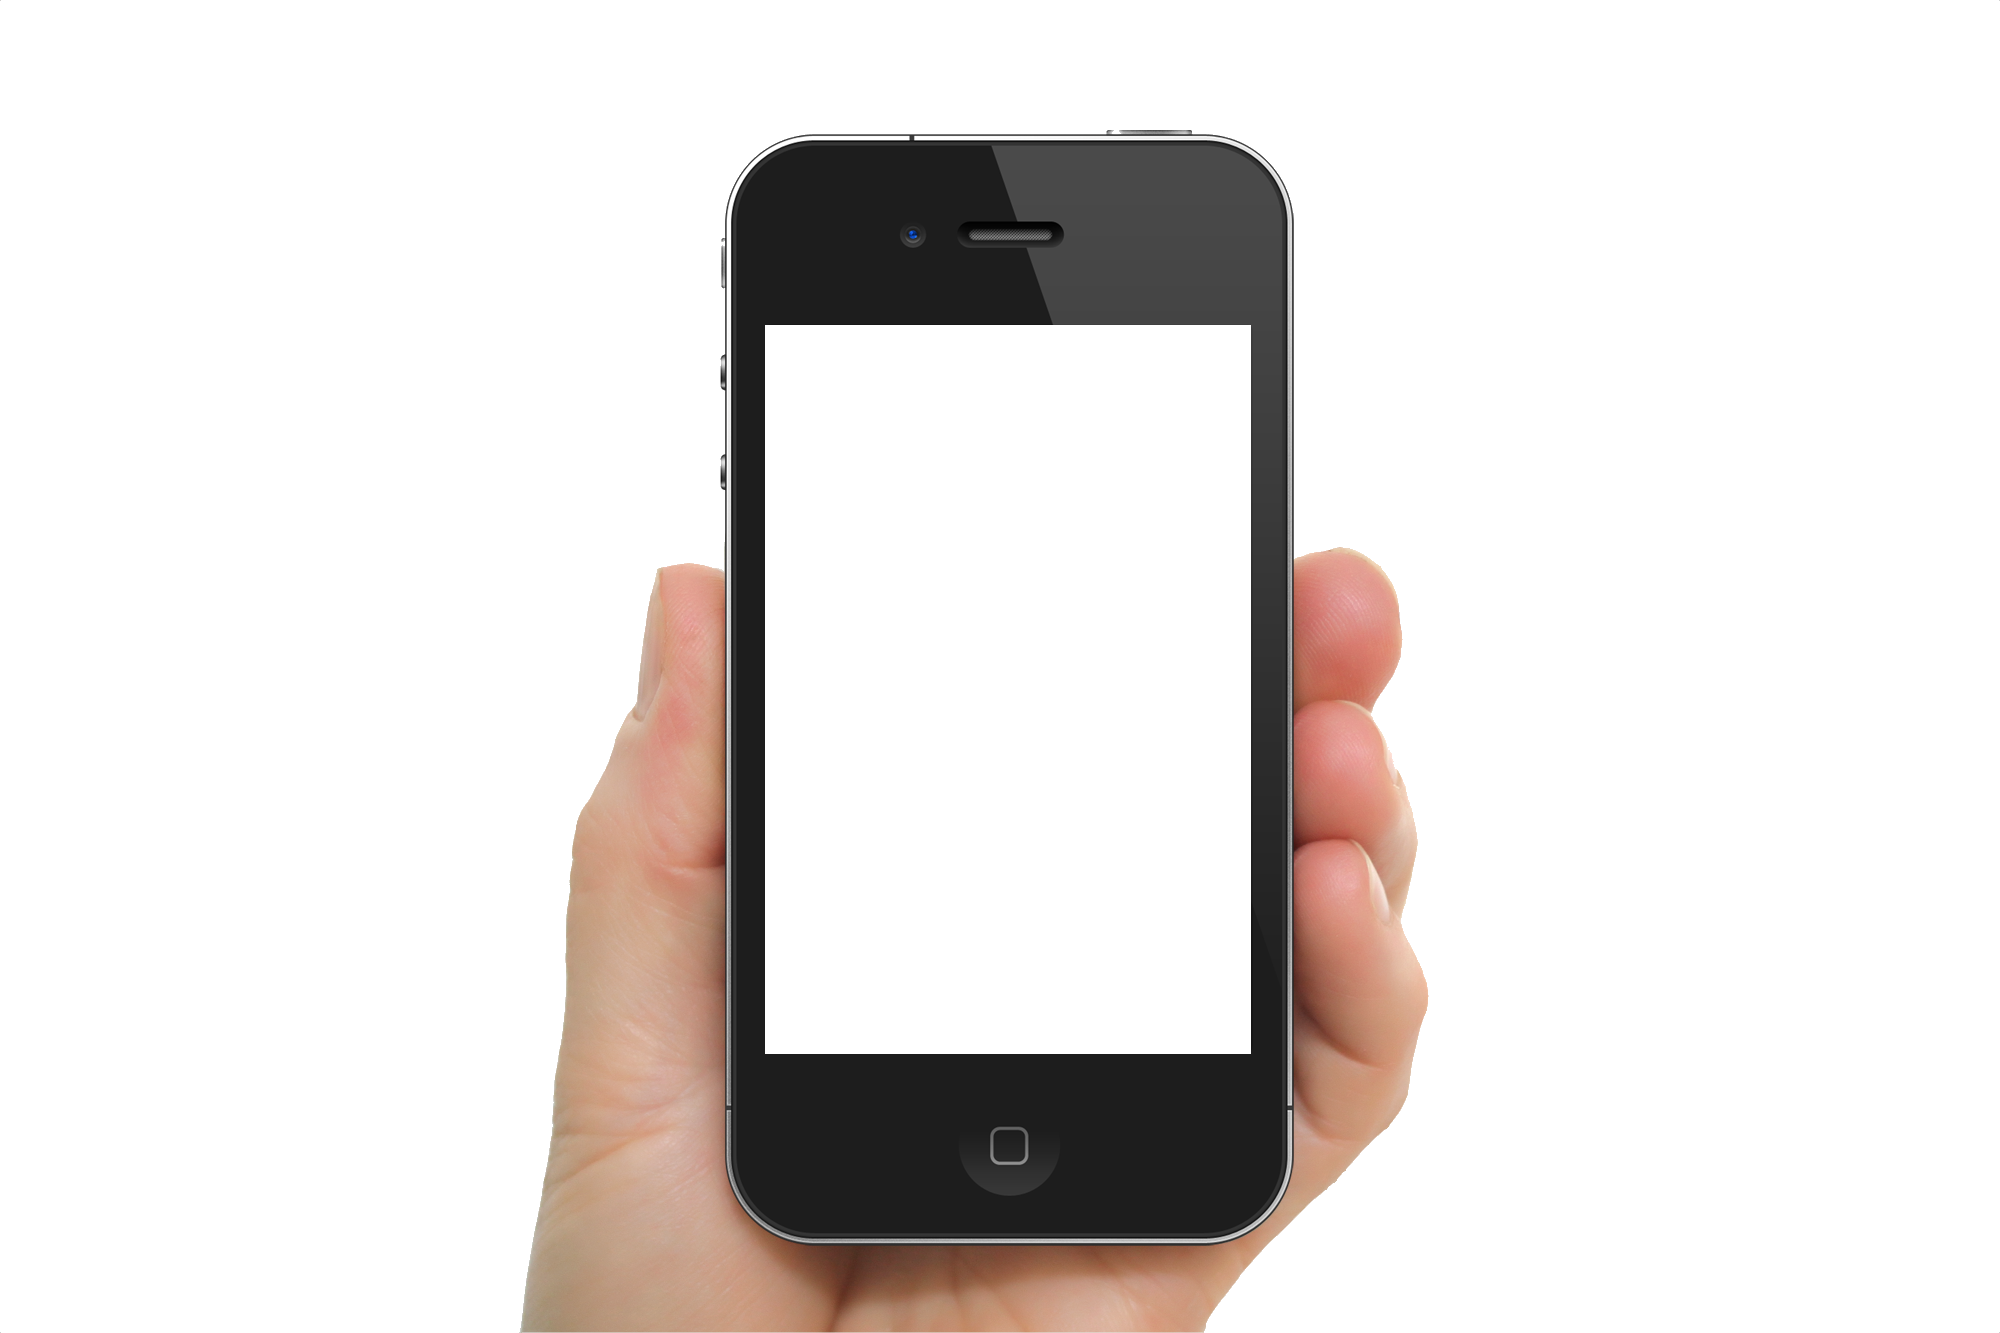 Apple phone clipart png transparent Iphone Apple PNG Image - PurePNG | Free transparent CC0 PNG Image ... png transparent